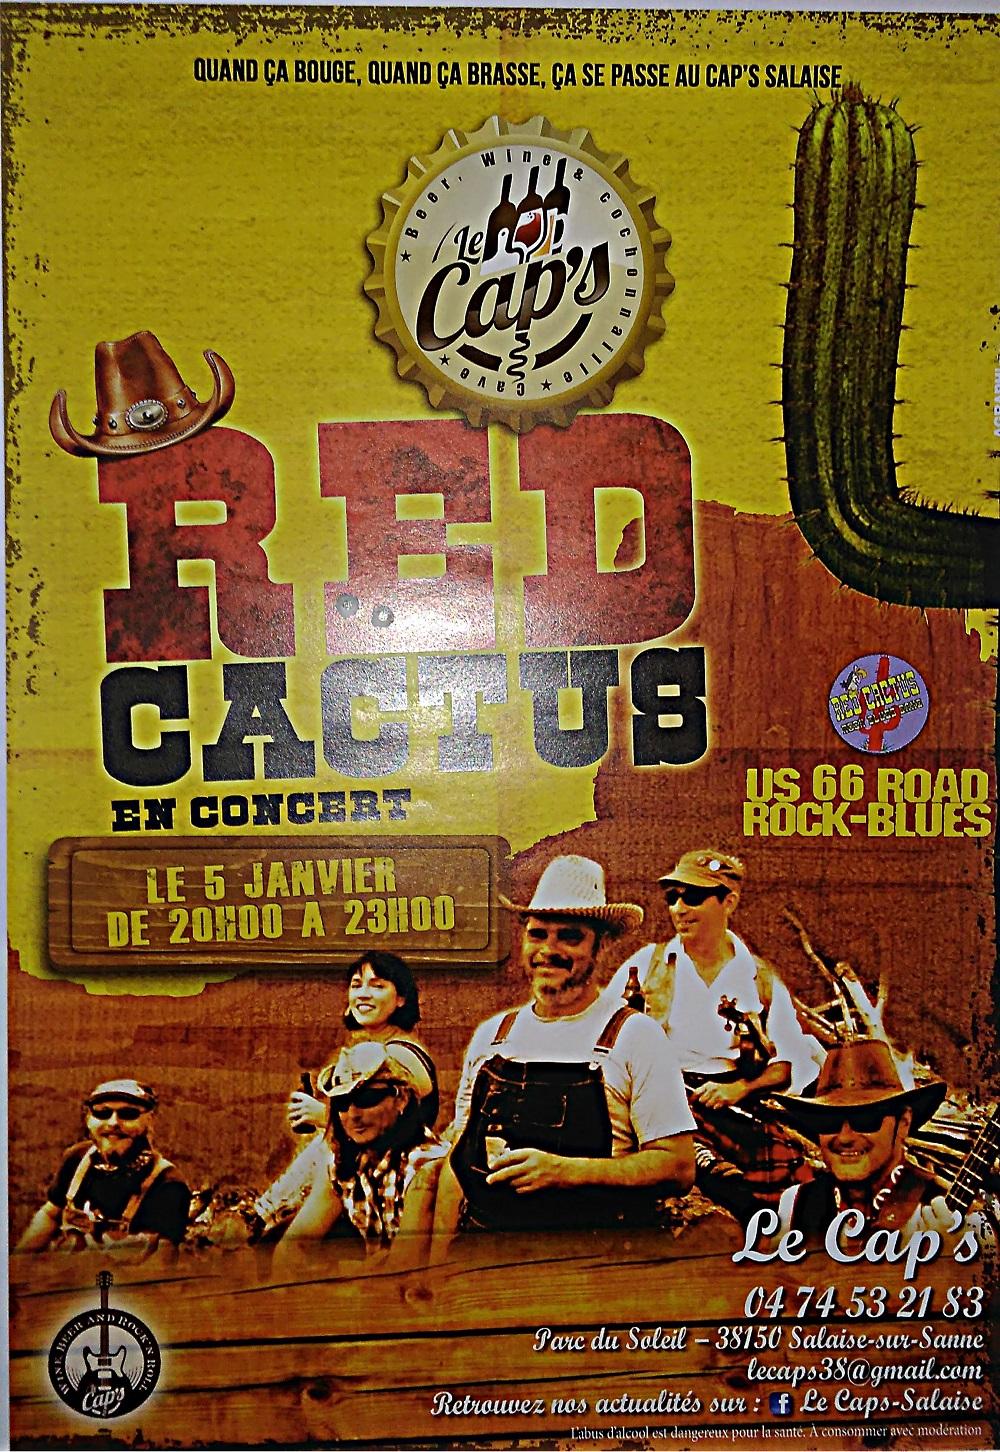 Redcactuscaps